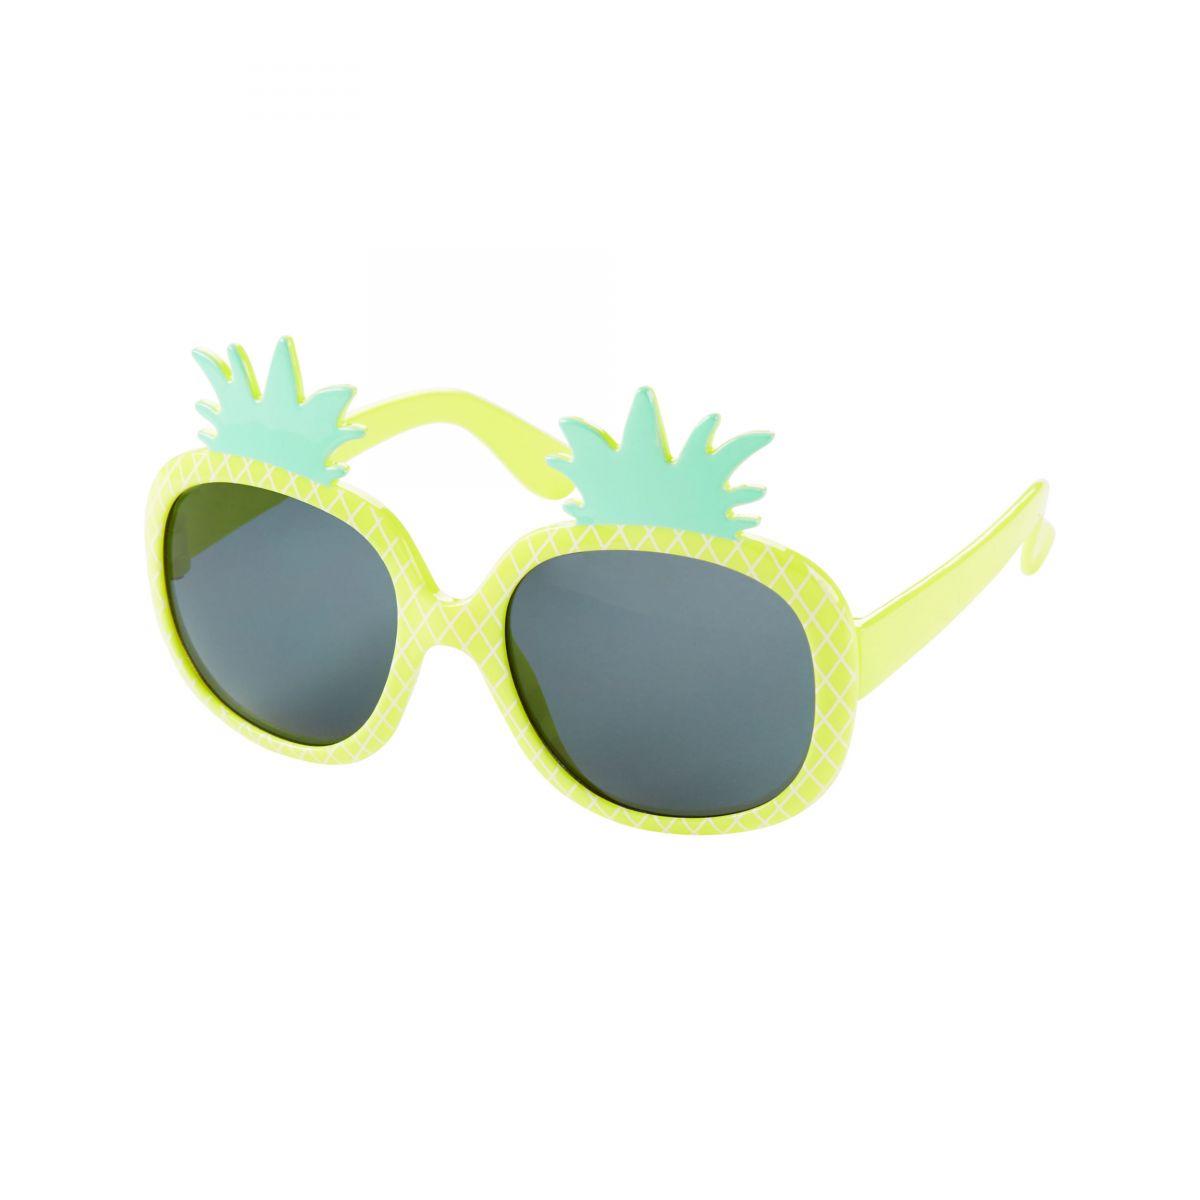 2b4304f2cc841 Oculos de Sol para Meninas - Tam 0-24 meses - Vitrine Baby